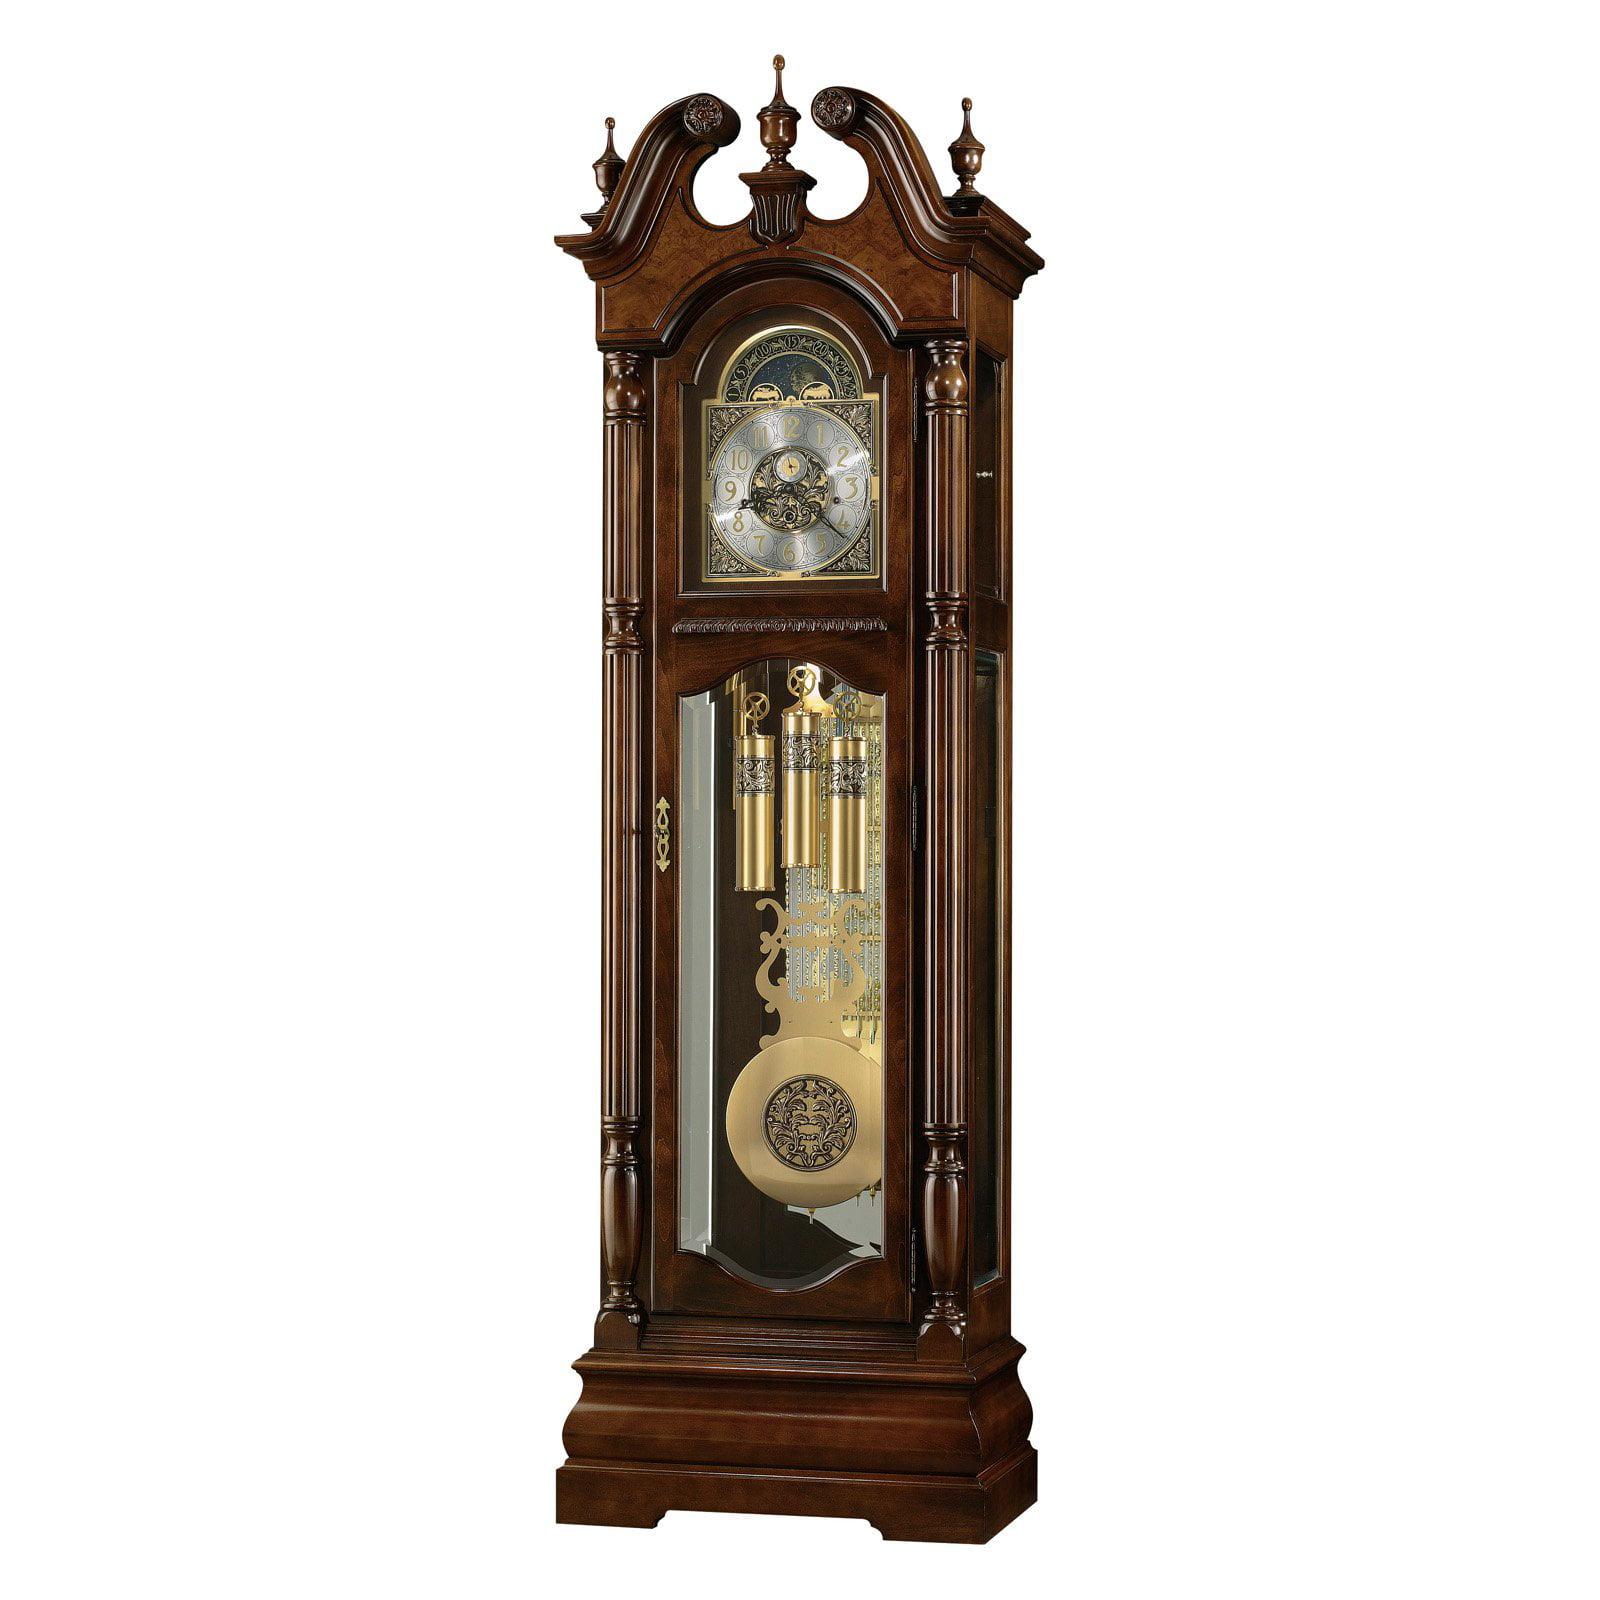 Howard Miller 611-142 Edinburg 82nd Anniversary Grandfather Clock by Howard Miller